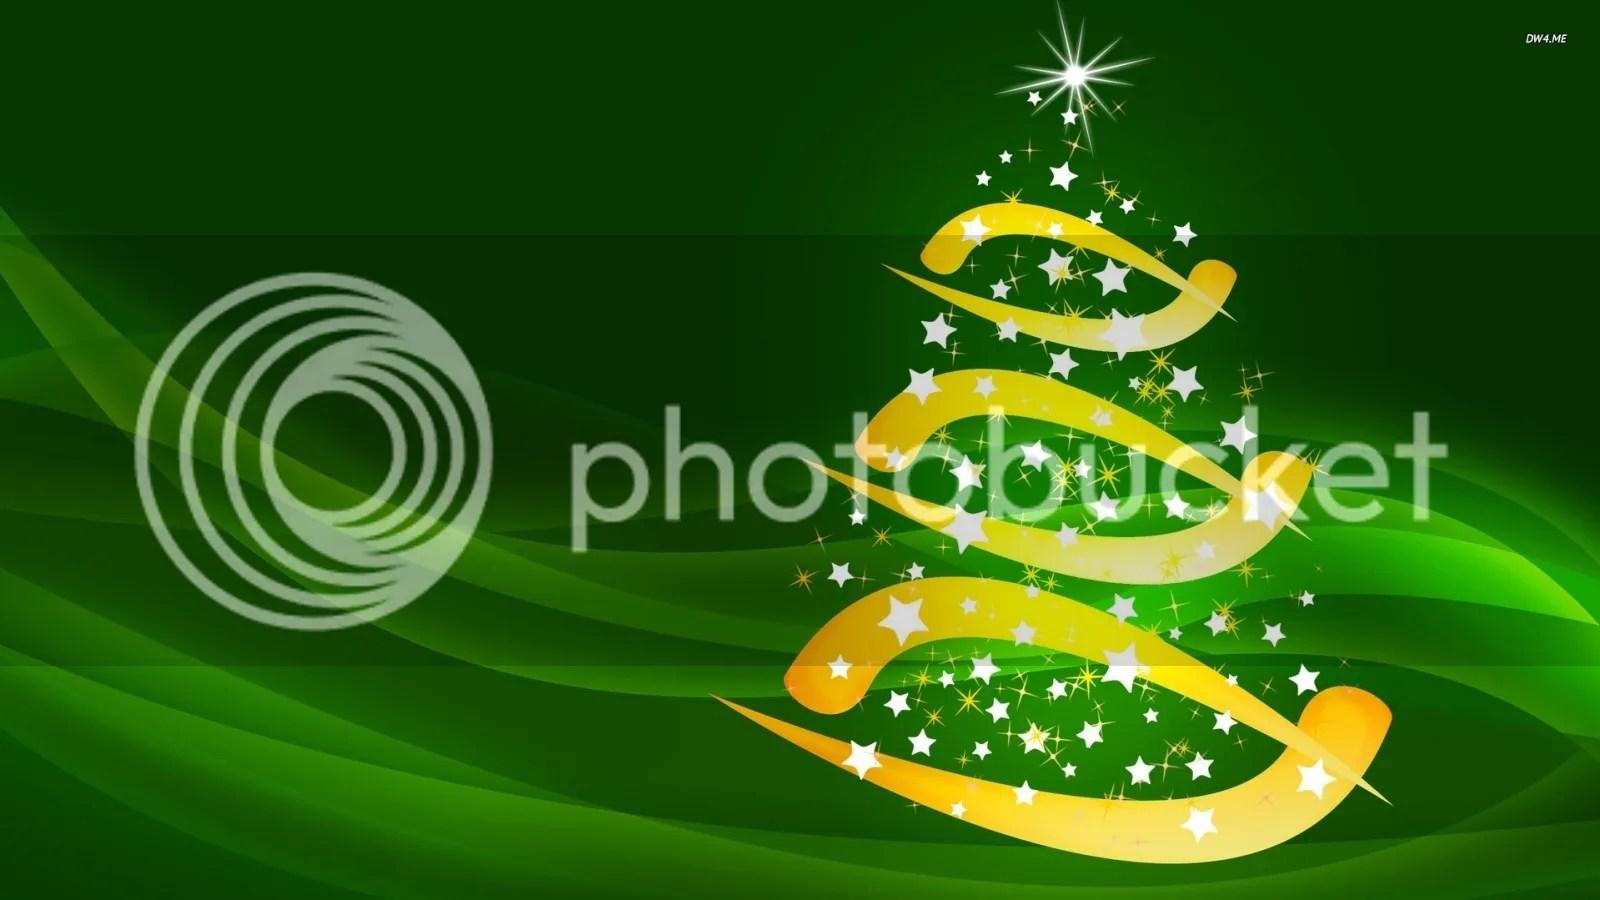 photo Christmas tree_zpsbudhocfj.jpg